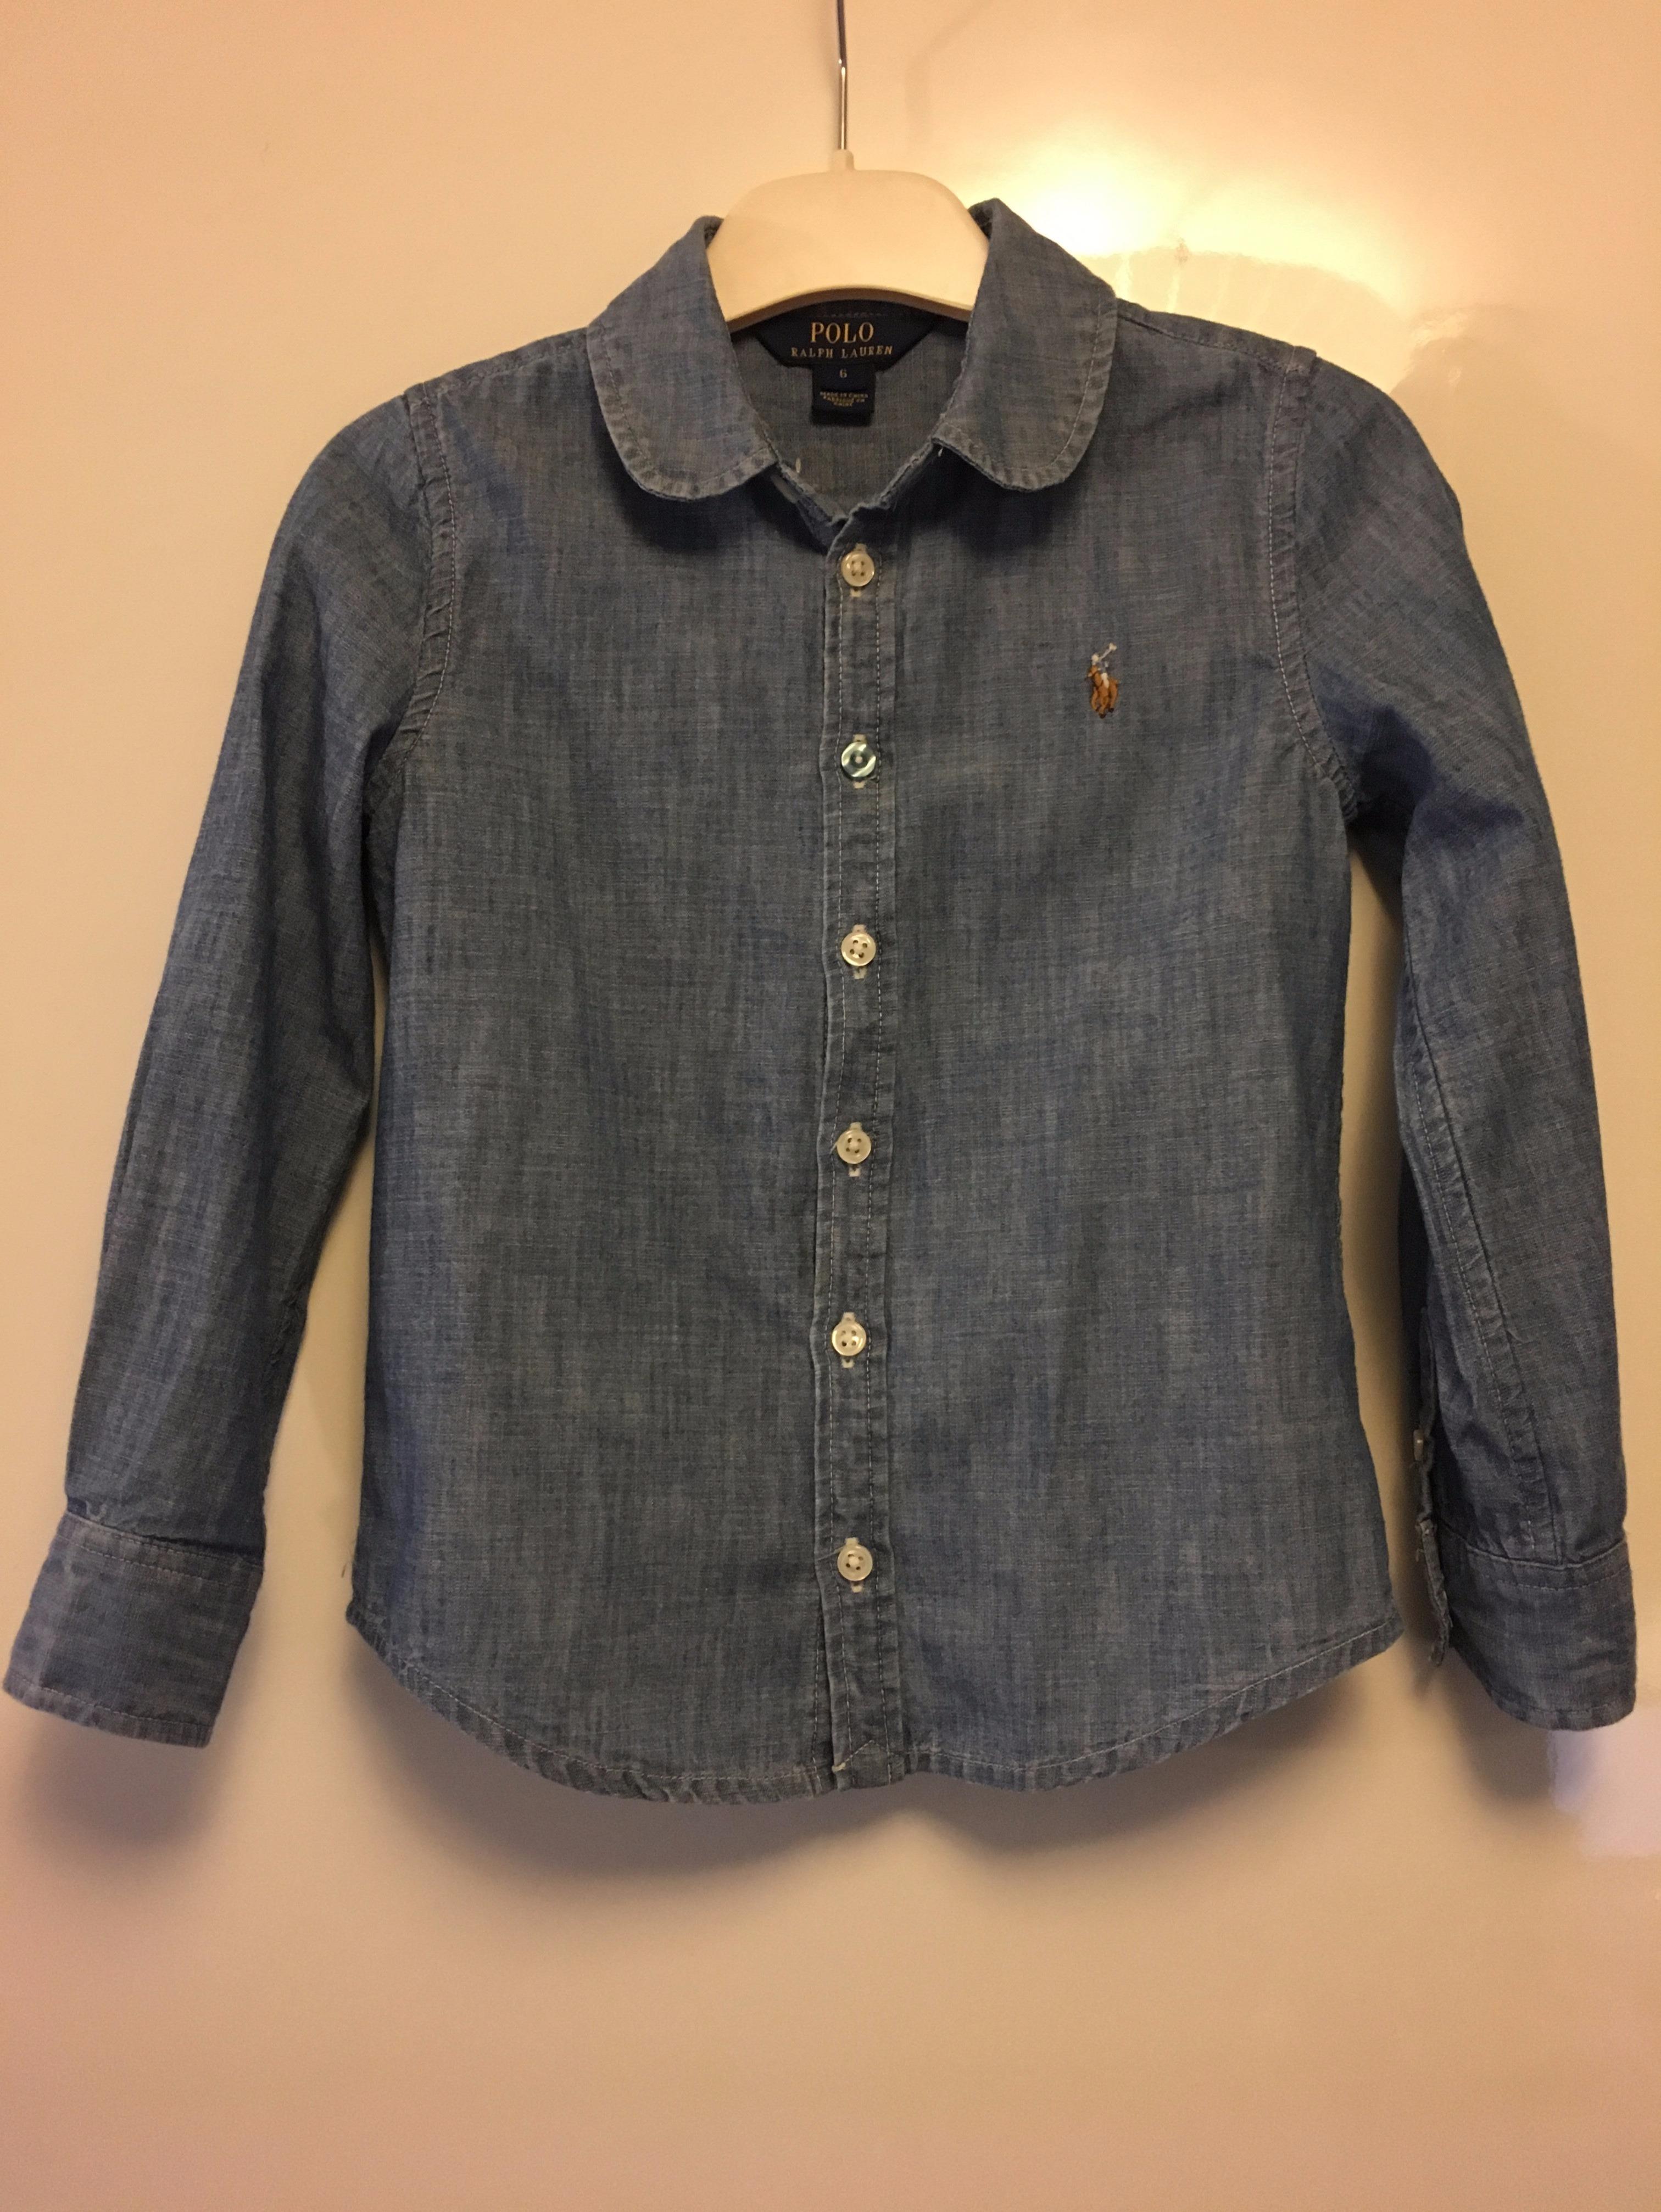 07397337563f Купить блузку и рубашку Ralph Lauren за 1000 руб. в интернет ...